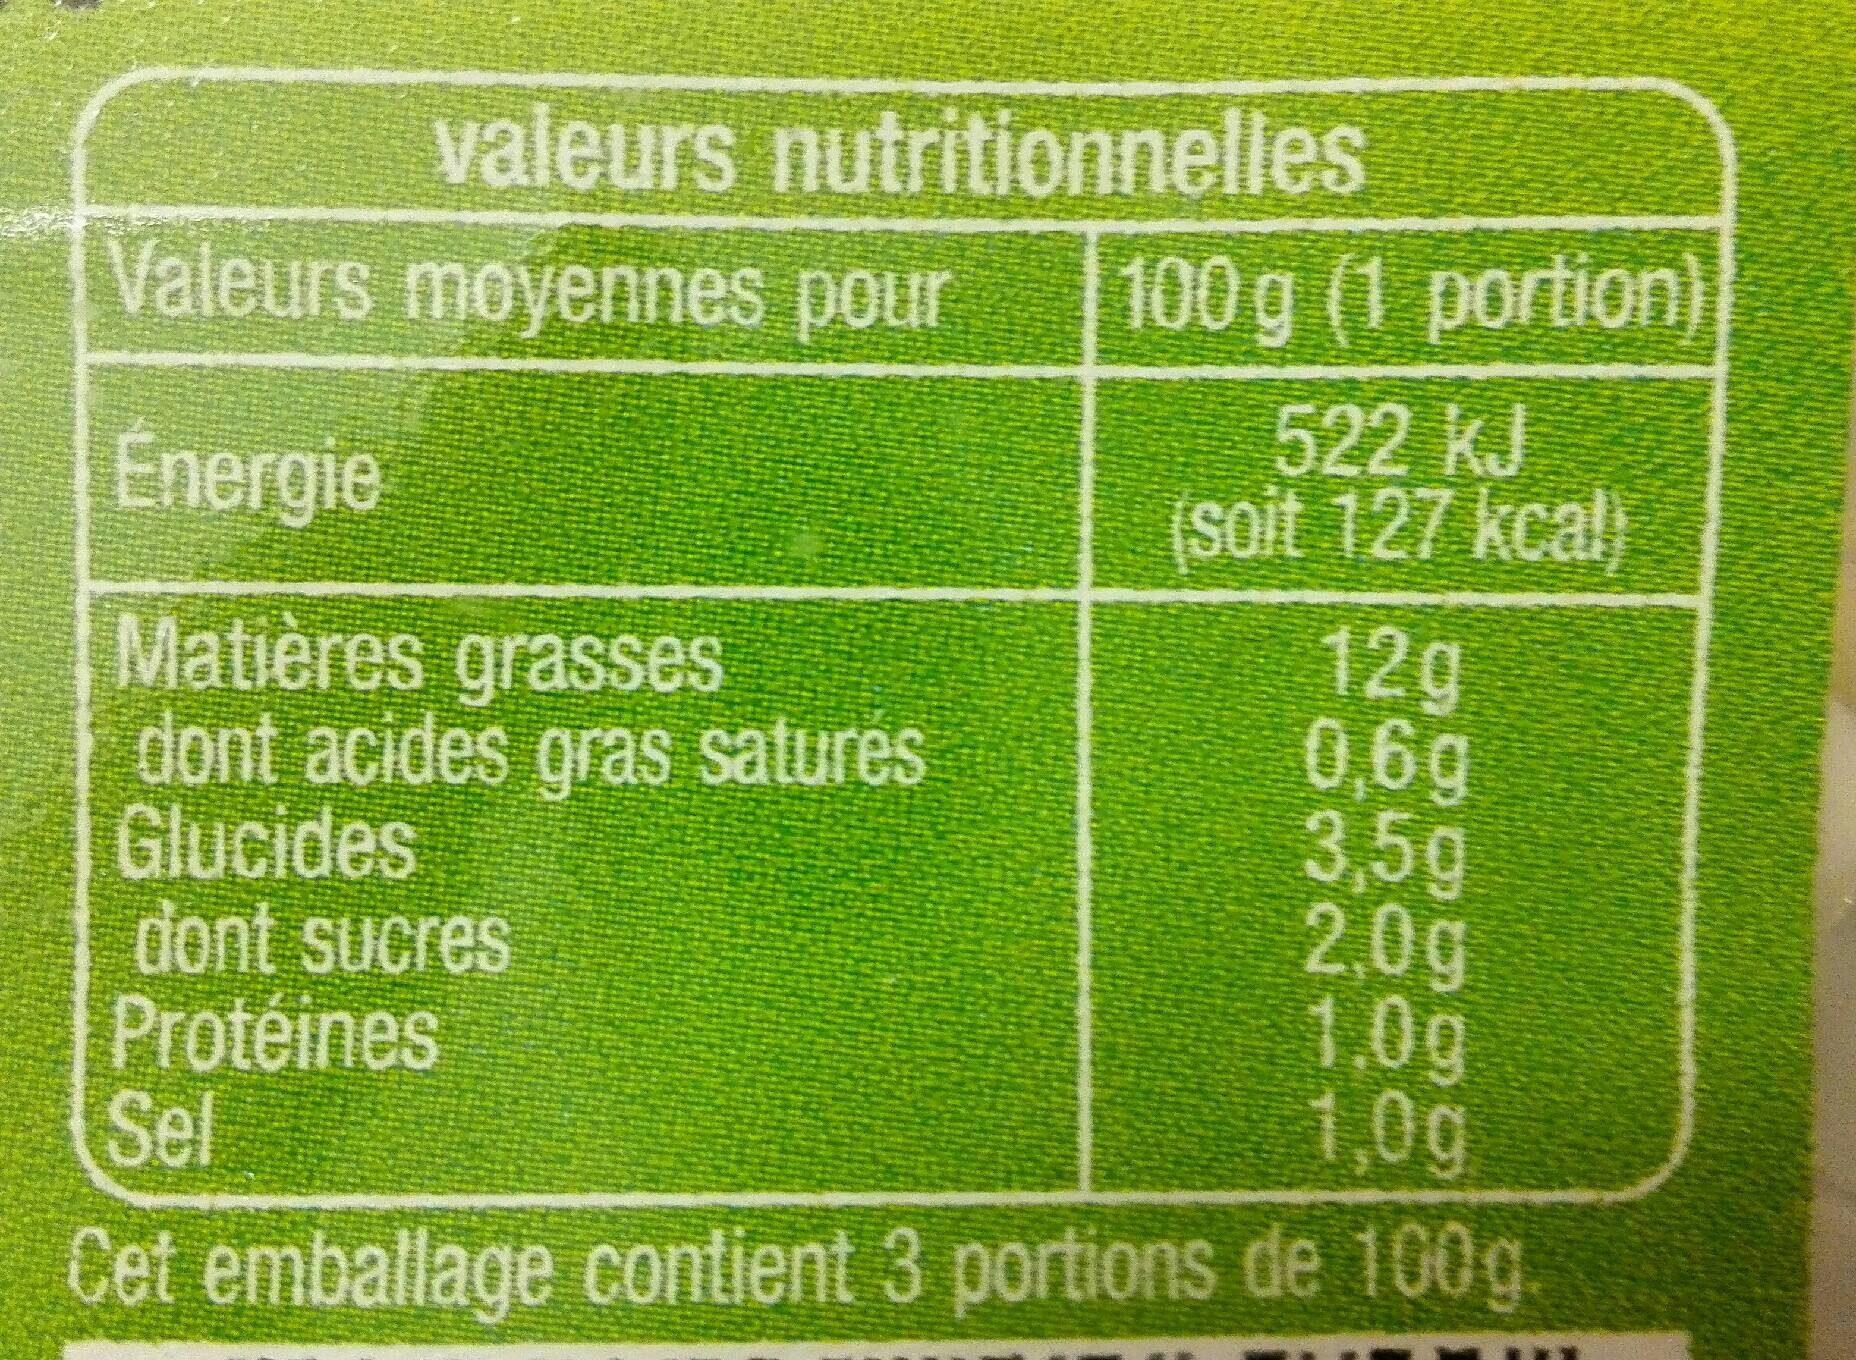 Céleri rémoulade - Voedingswaarden - fr